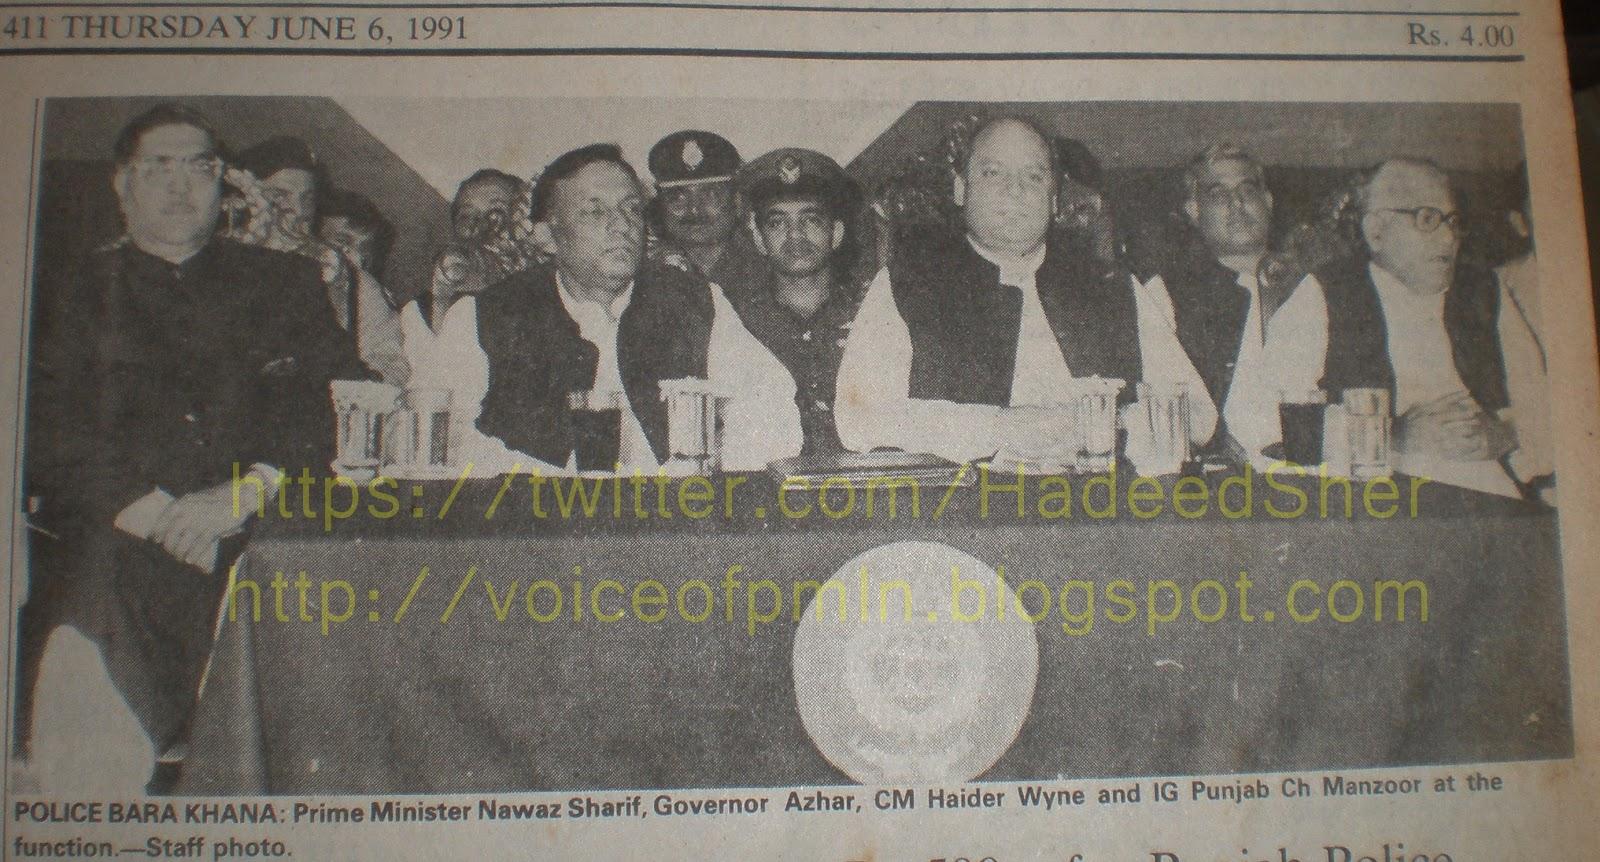 September 2012 ~ Pakistan Muslim League-Nawaz (PMLN)